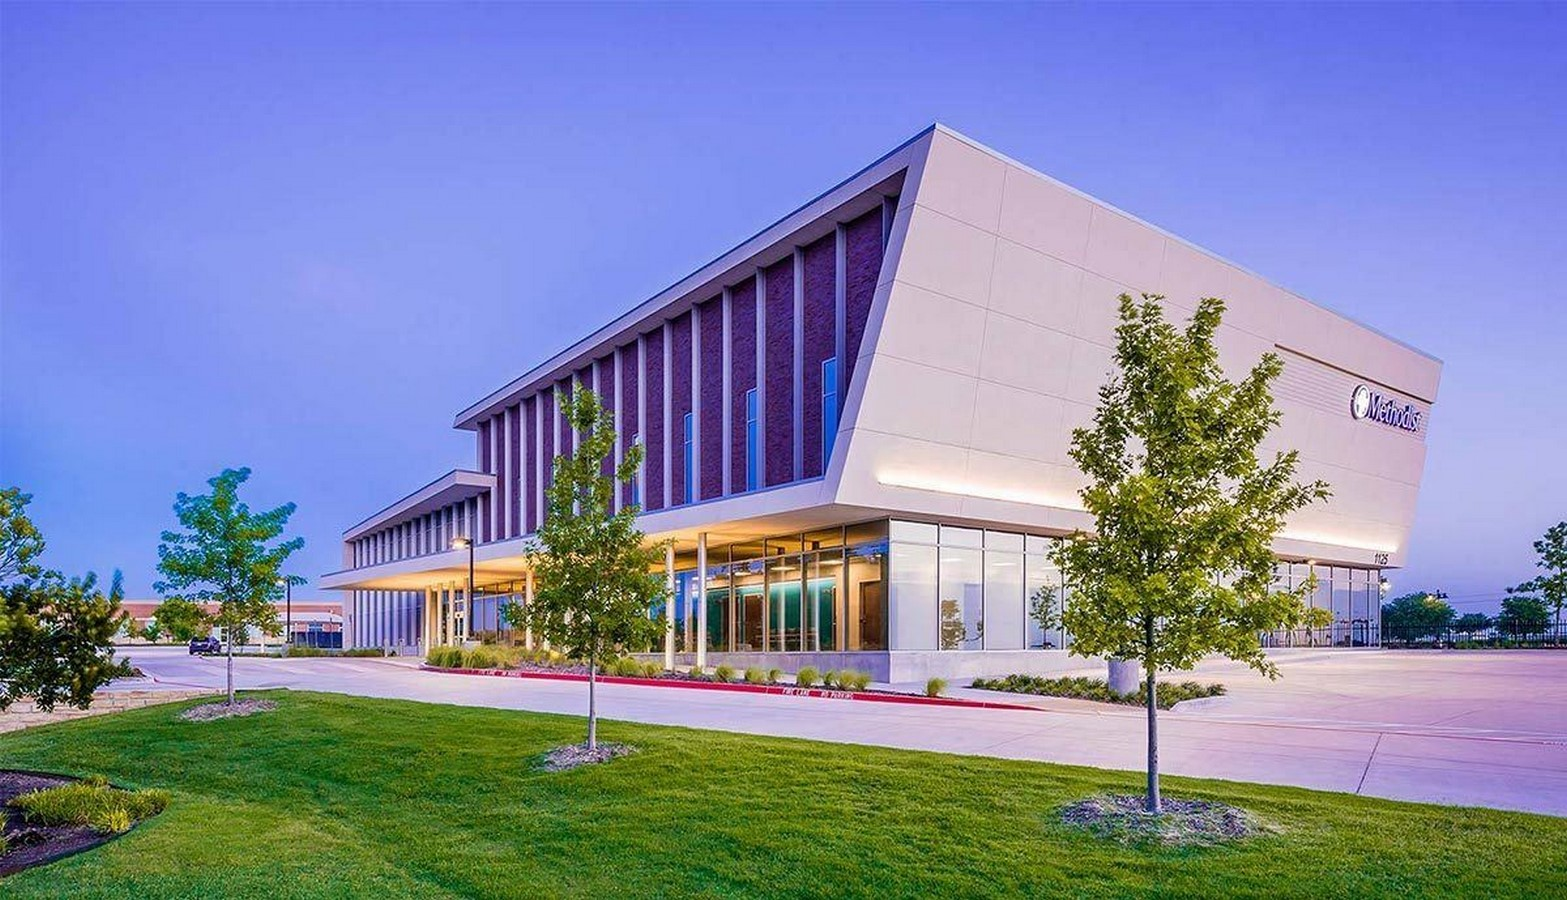 Architects in Kansas city - Top 90 Architects in Kansas city - Sheet35